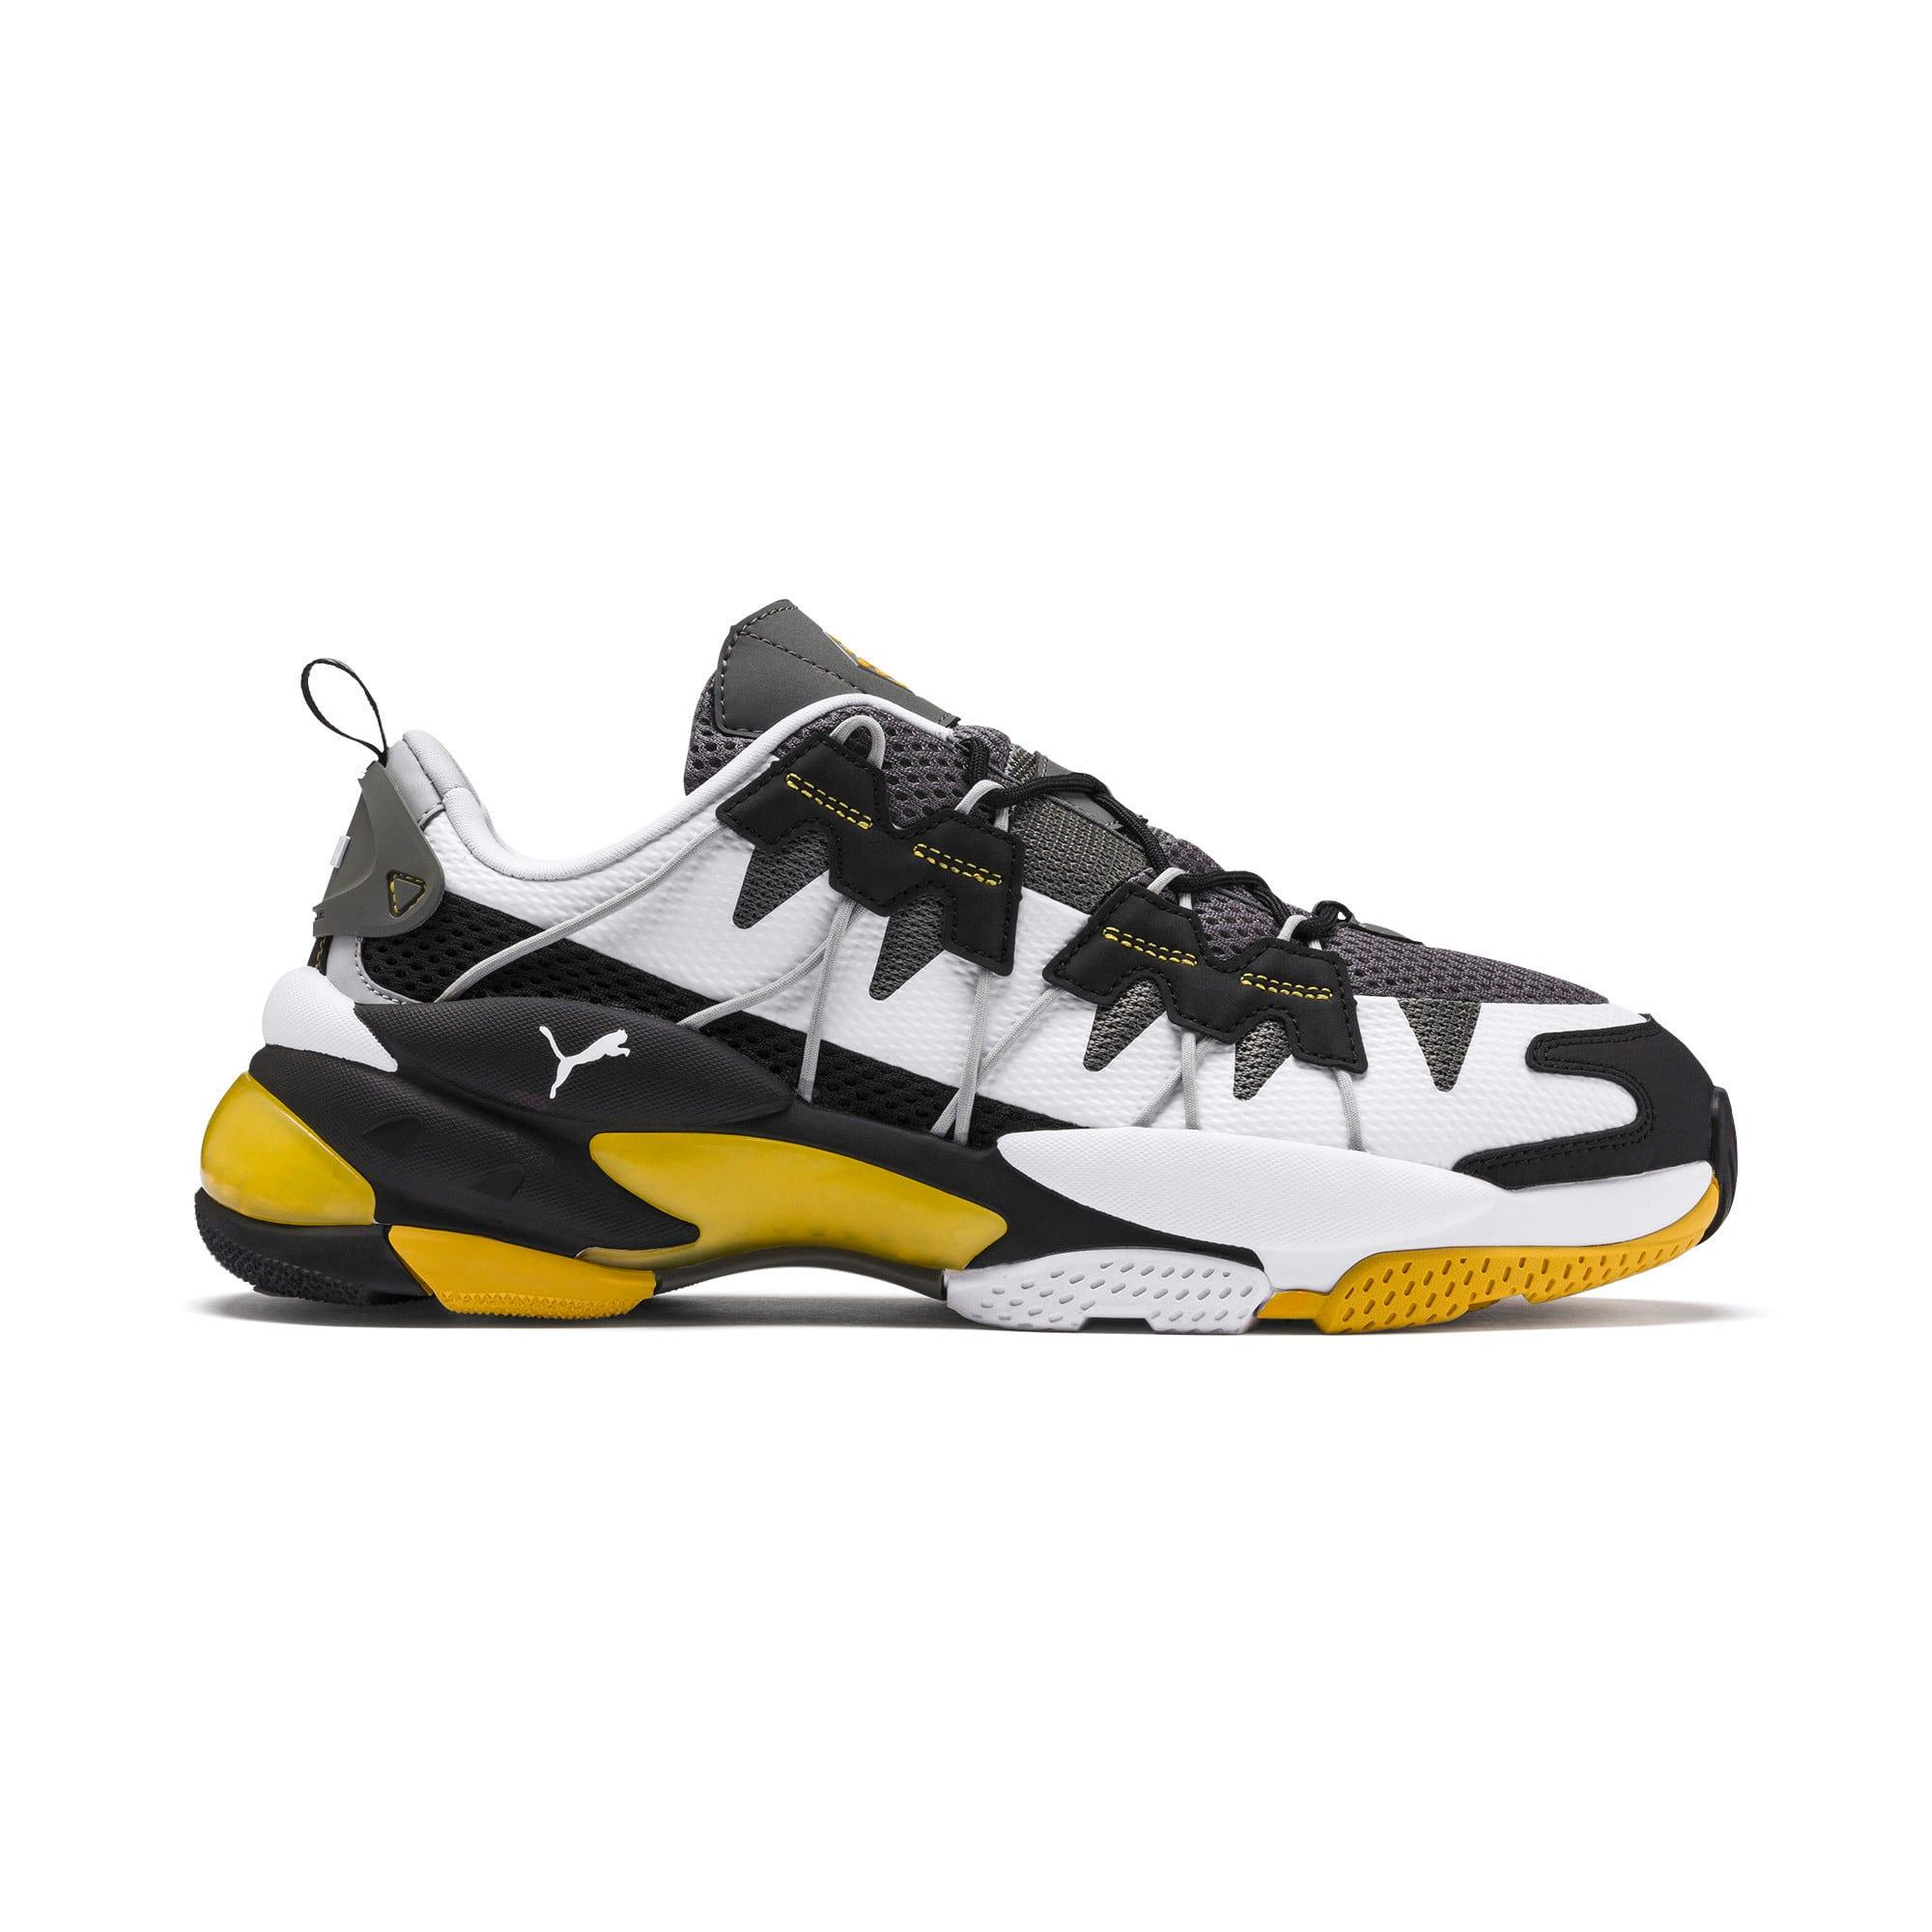 Thumbnail 5 of LQDCELL Omega Training Shoes, Puma Black-CASTLEROCK, medium